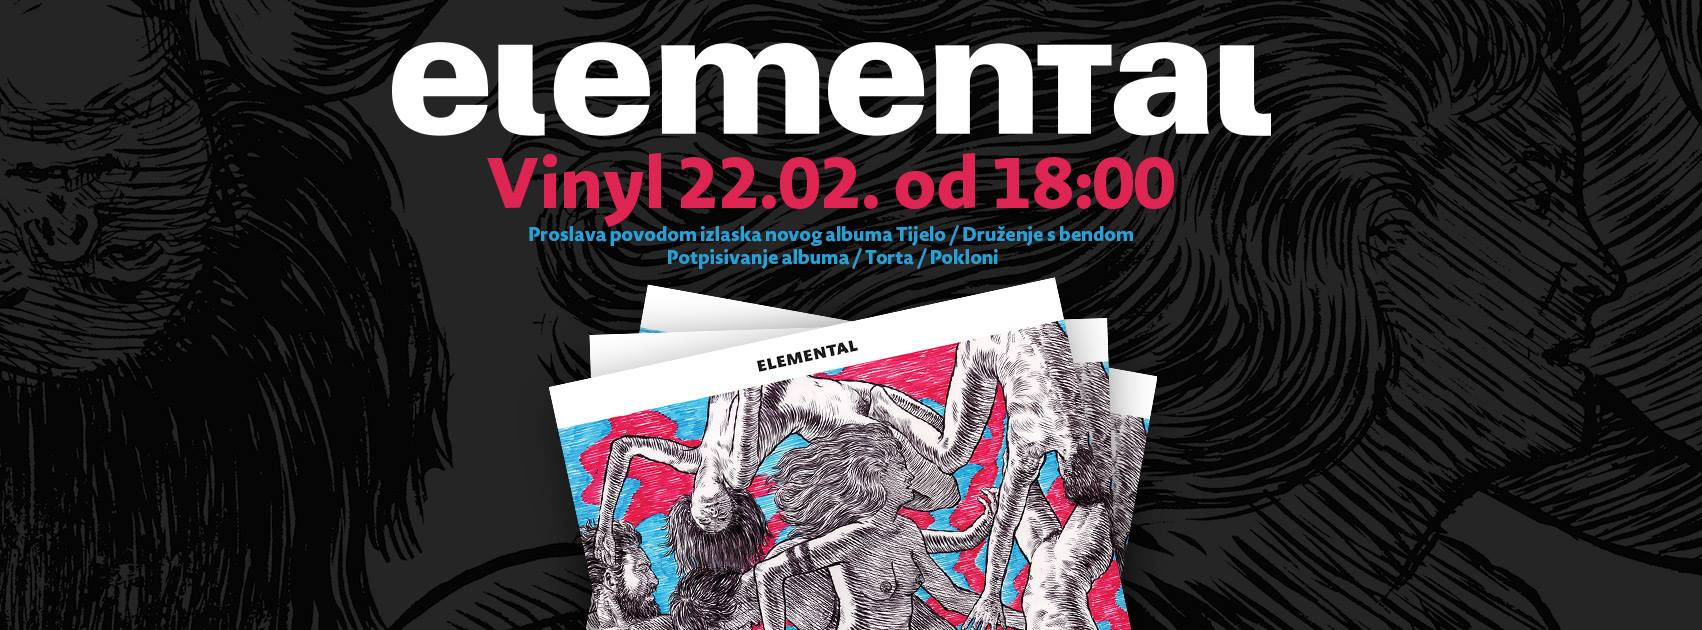 Elemental novi album tijelo